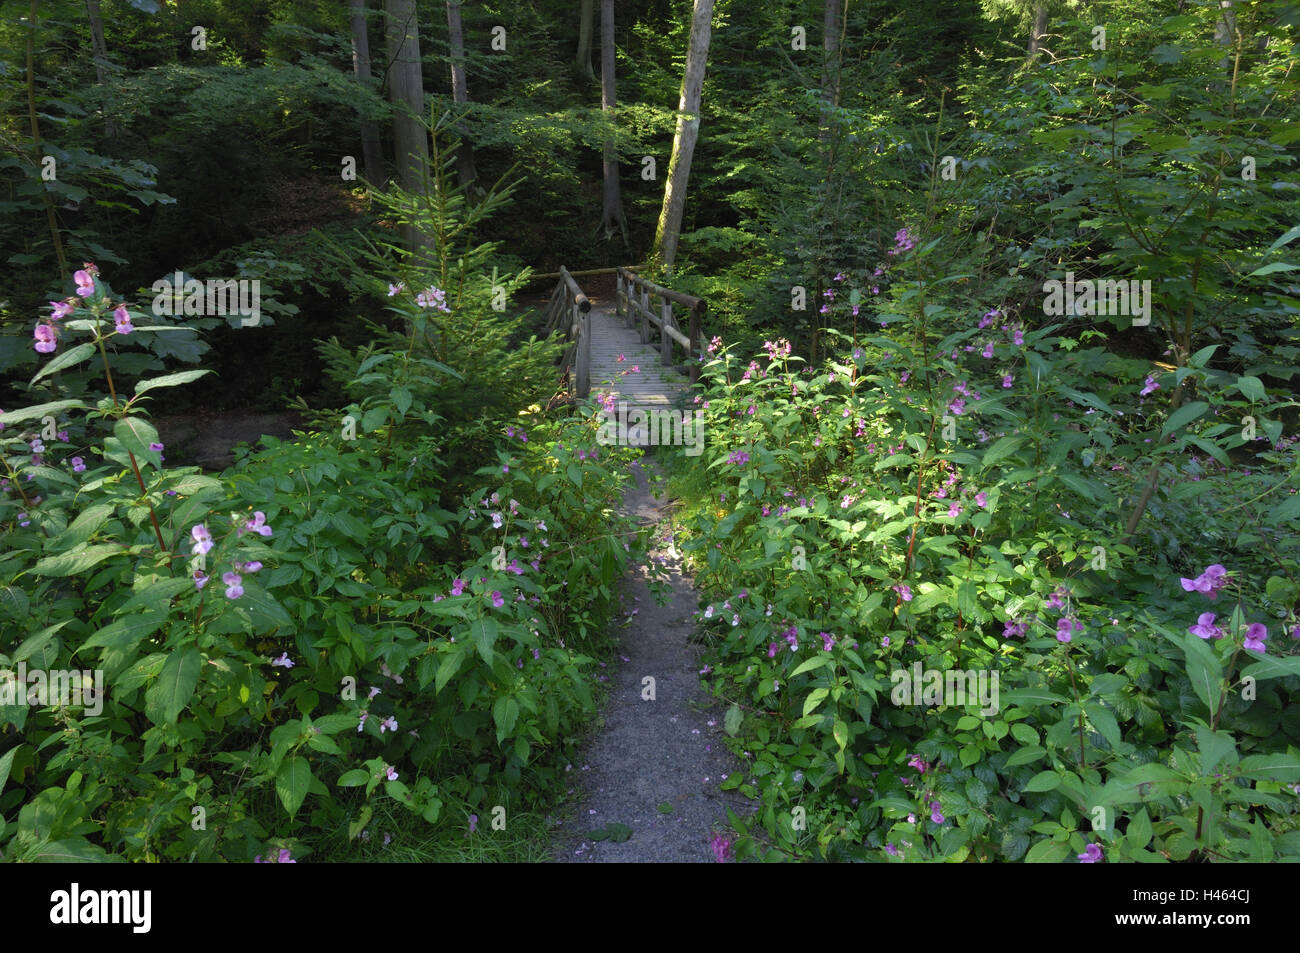 Wooden bridge, brook, forest brook, Germany, Saxony, National Park, Saxon Switzerland, - Stock Image